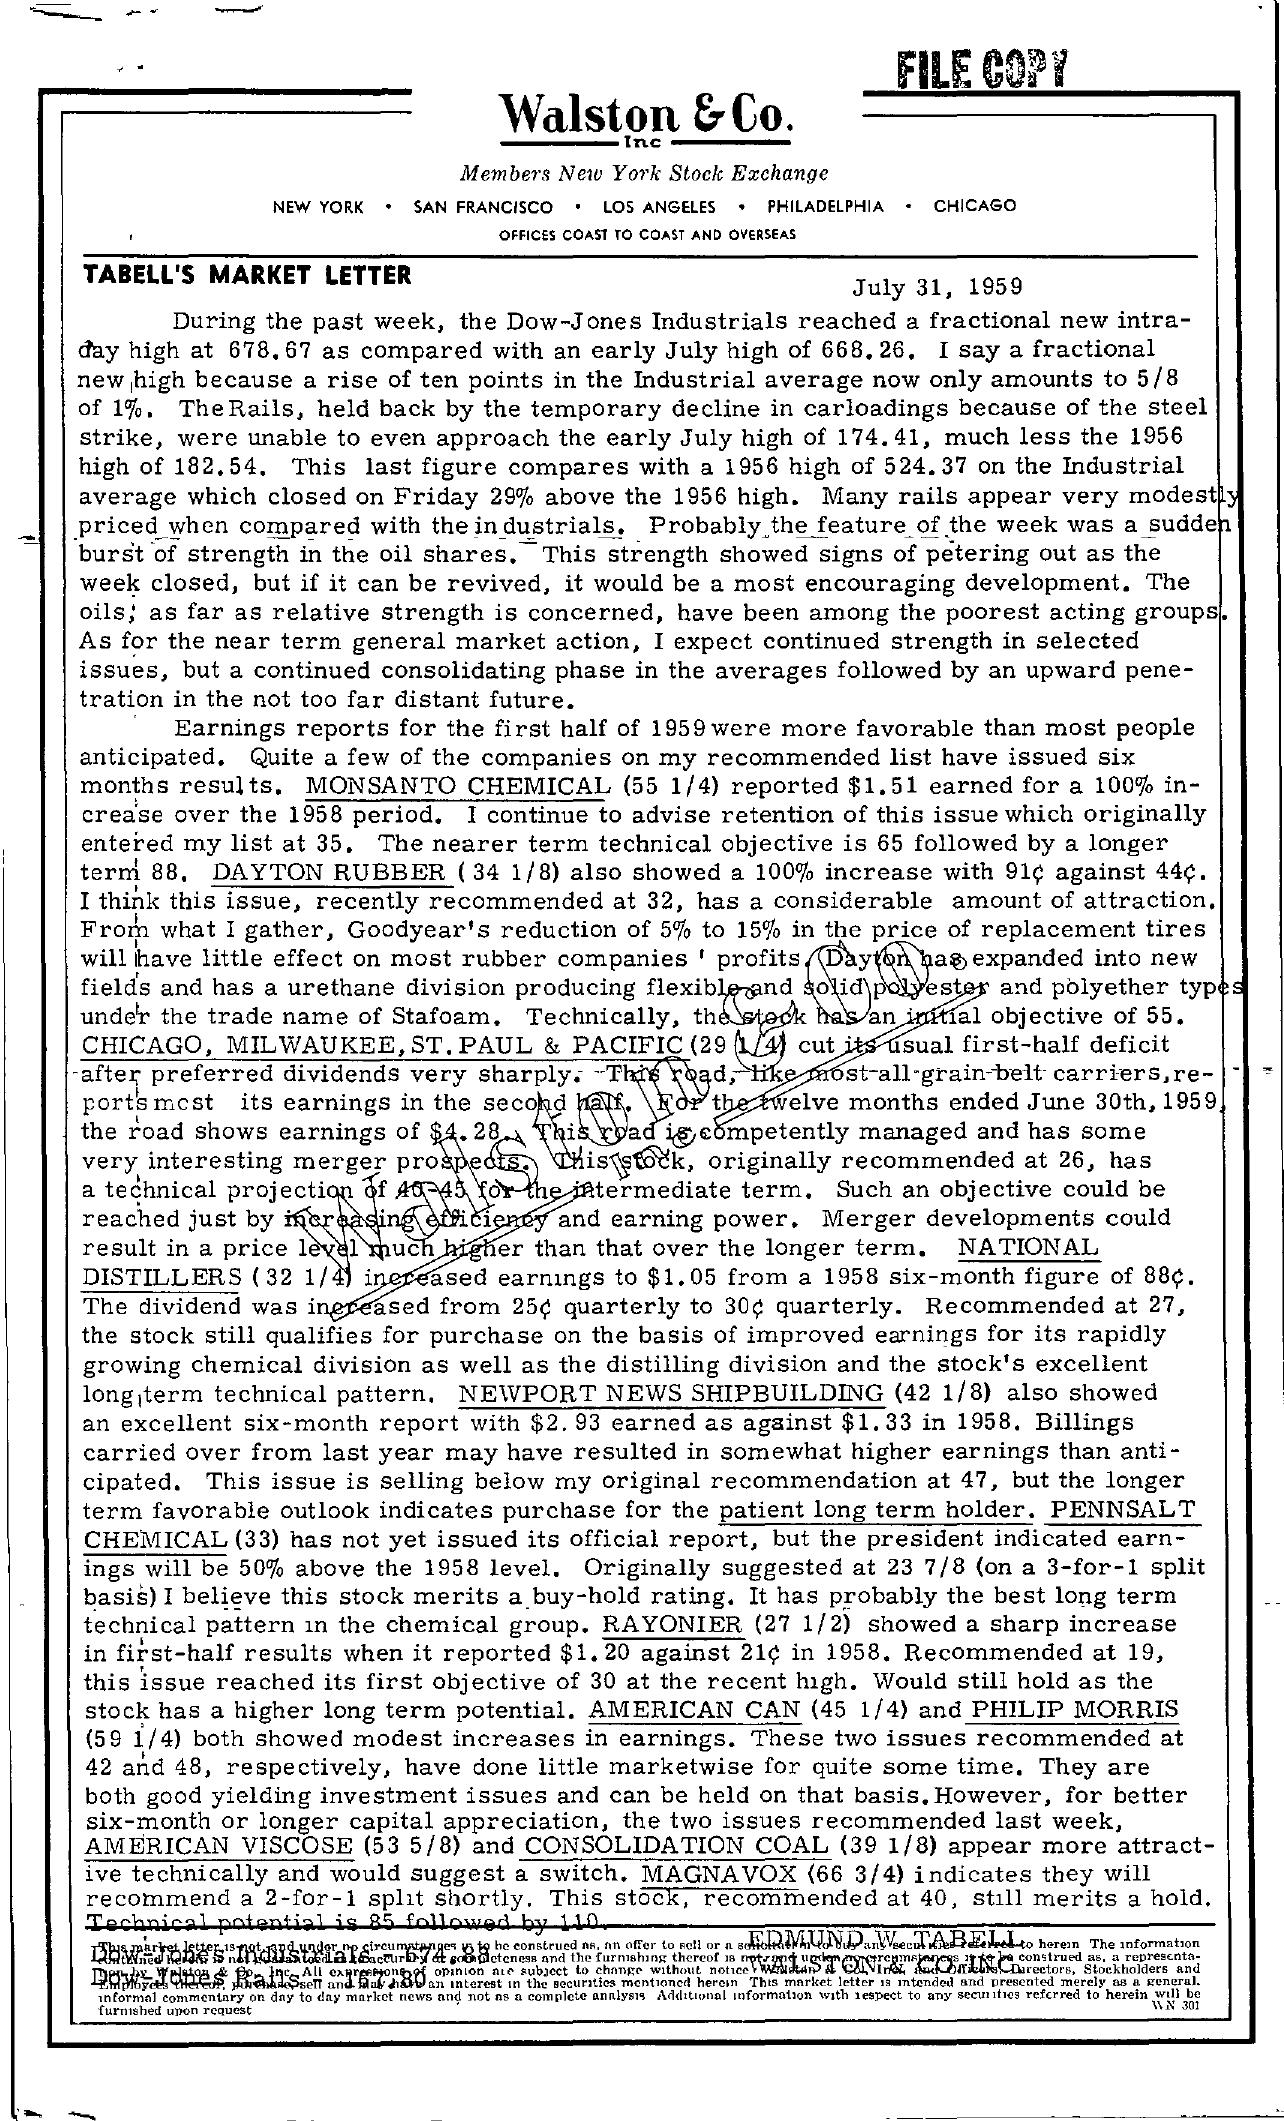 Tabell's Market Letter - July 31, 1959